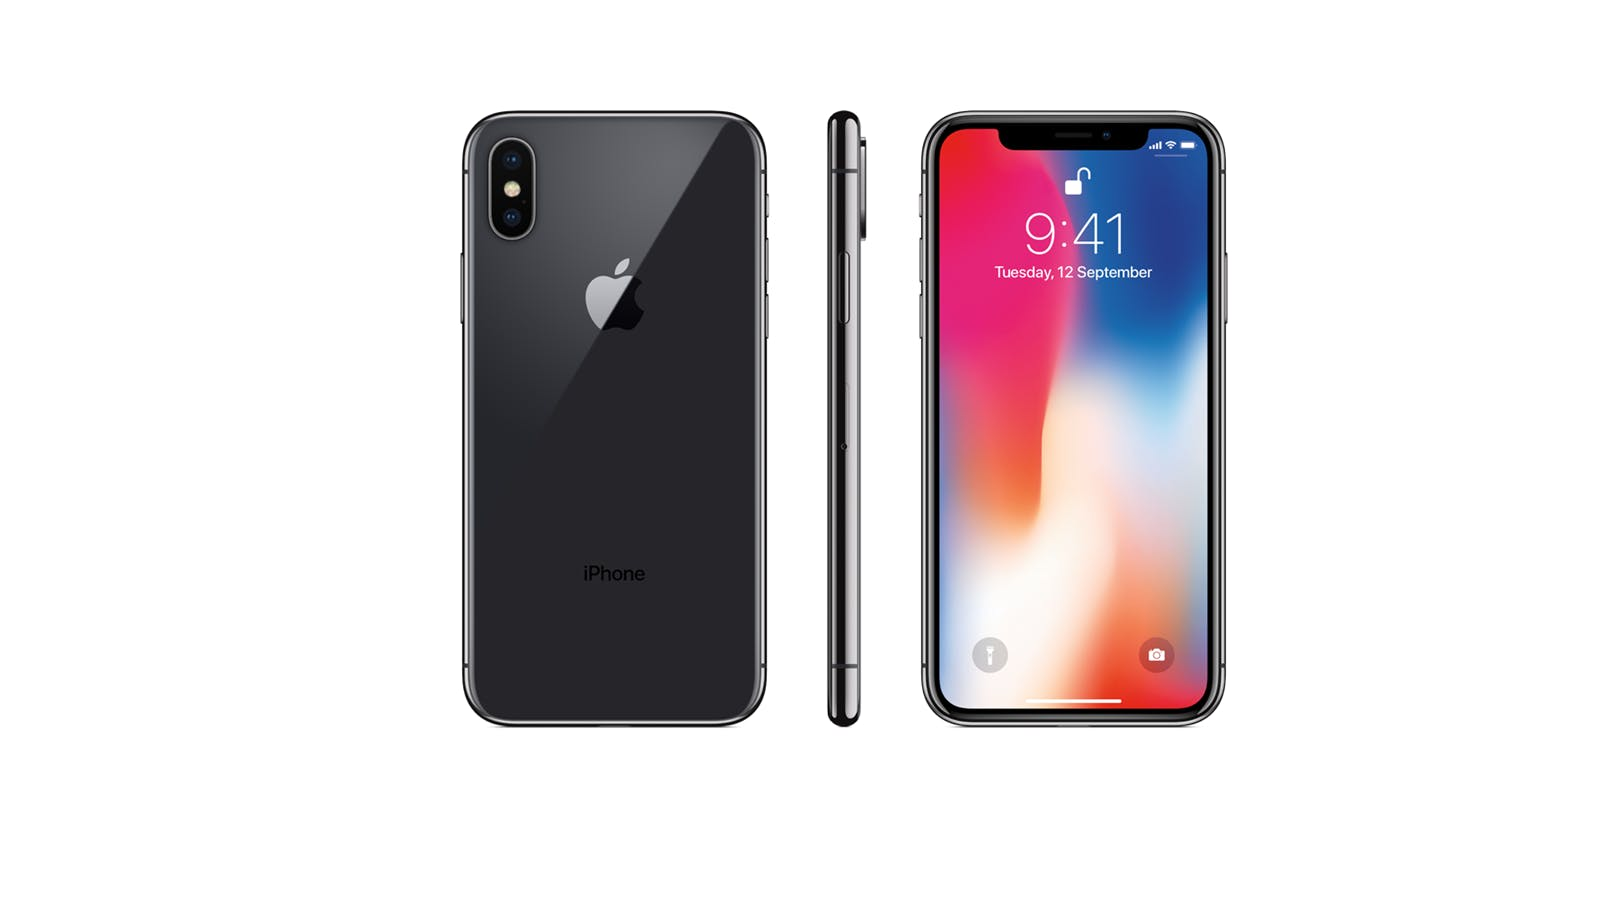 Apple Iphone X 256gb Space Grey Harvey Norman Malaysia